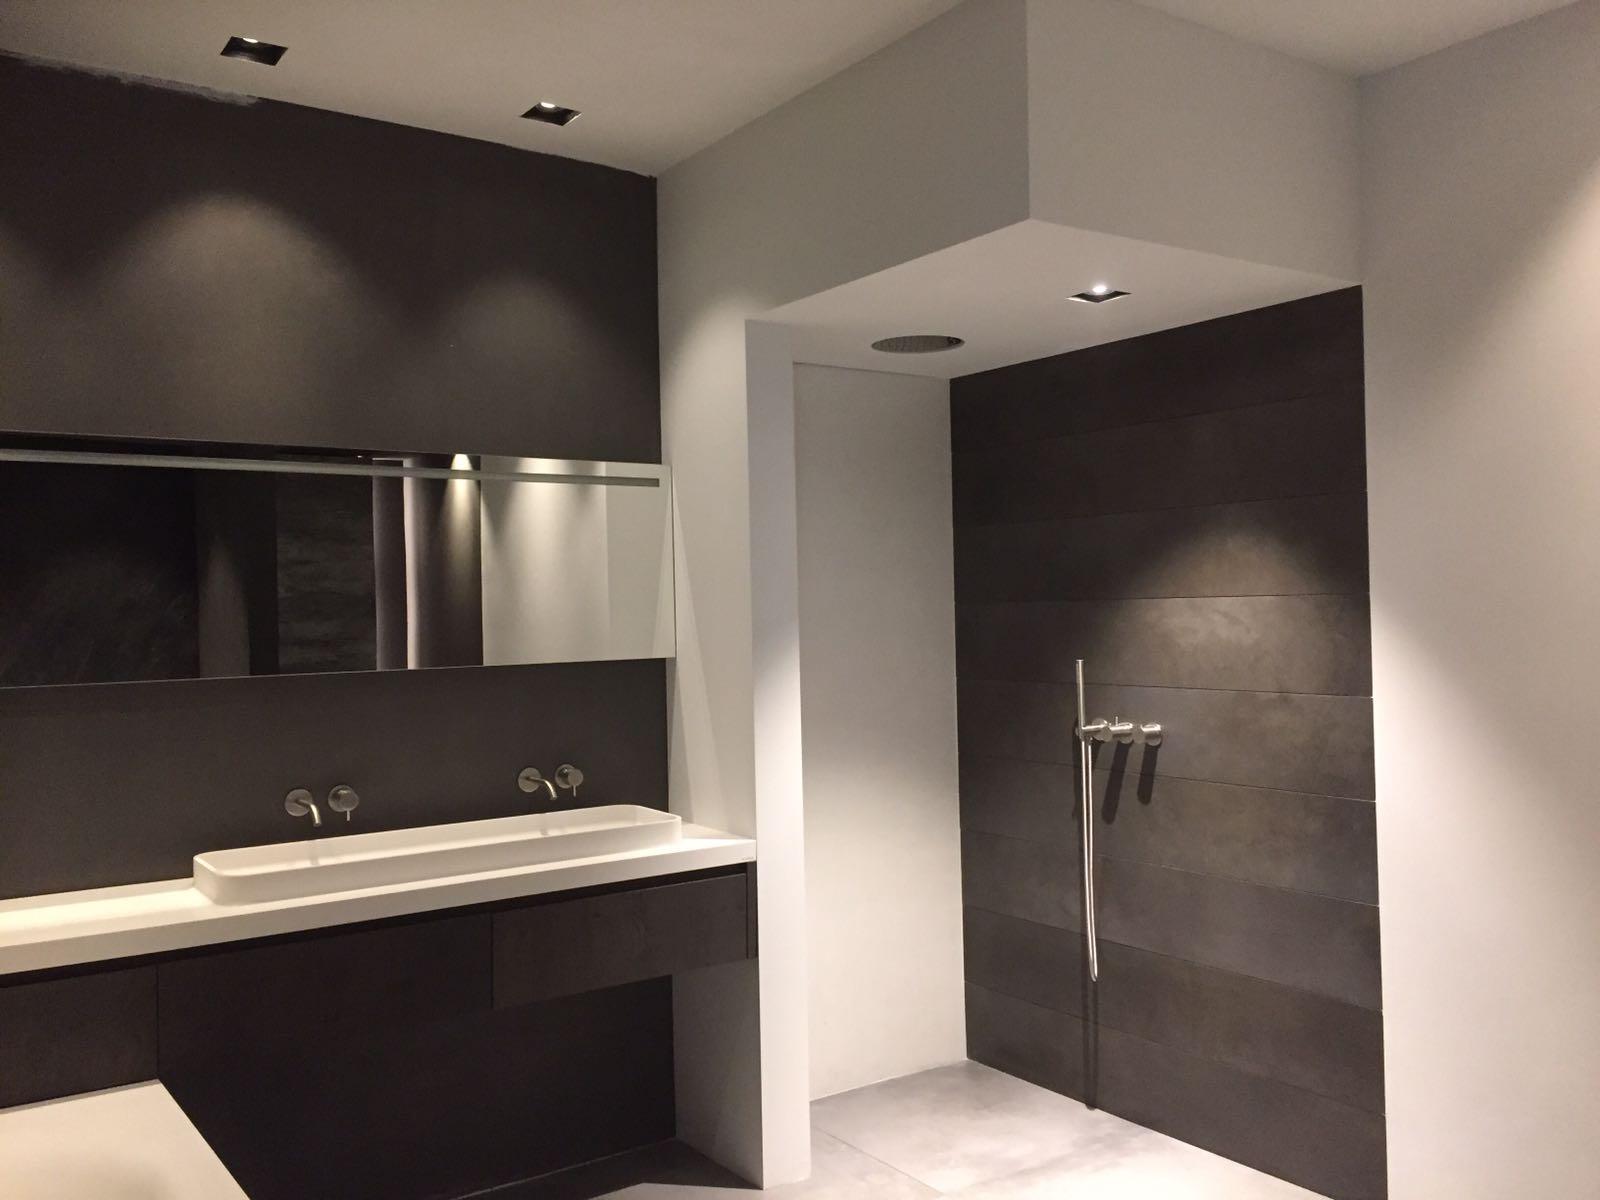 Badkamermeubel Onder Wastafel : Wastafel kastje decor wasbak badkamer huis ontwerp ideeen